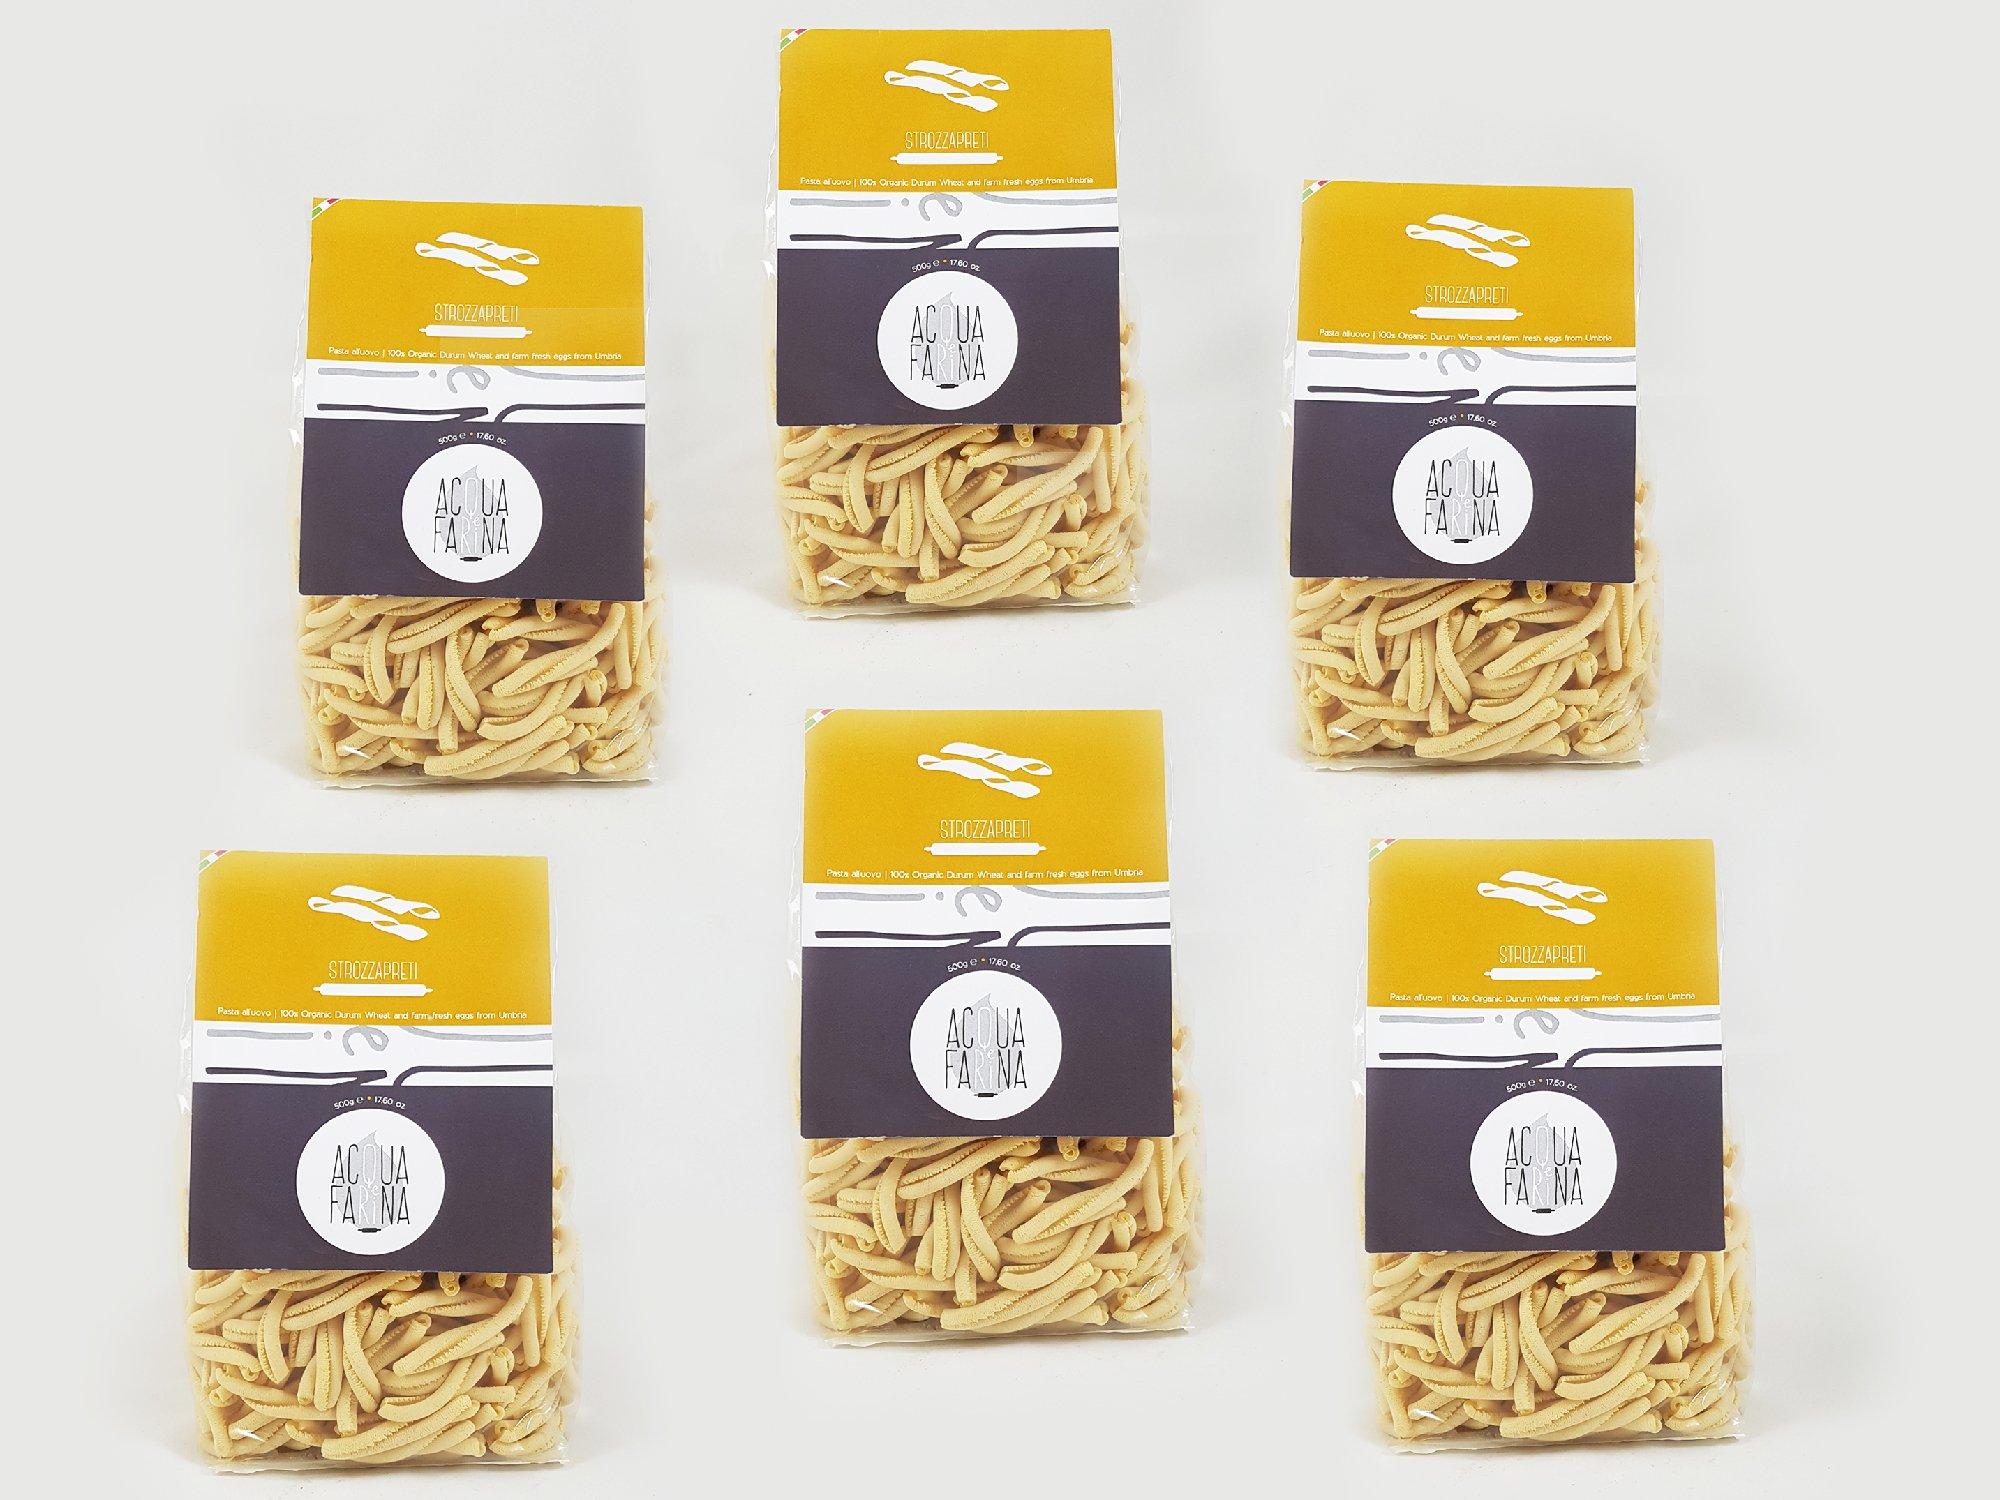 Strozzapreti 17.60 oz pack of 6